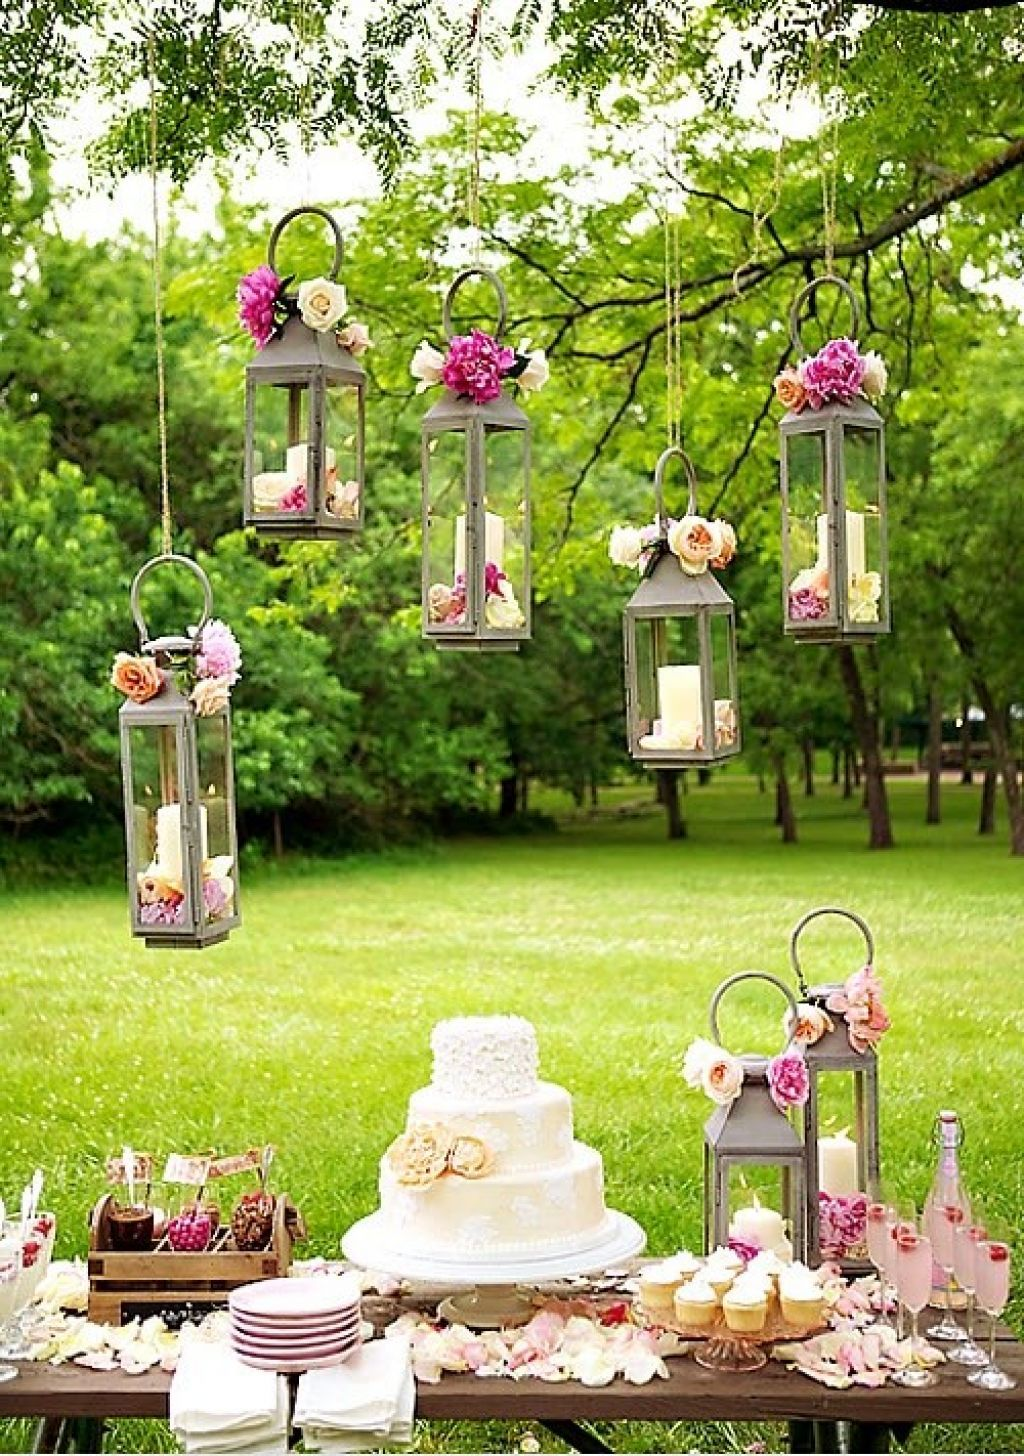 garden party ideas - Google Search | Creative Decorations ...